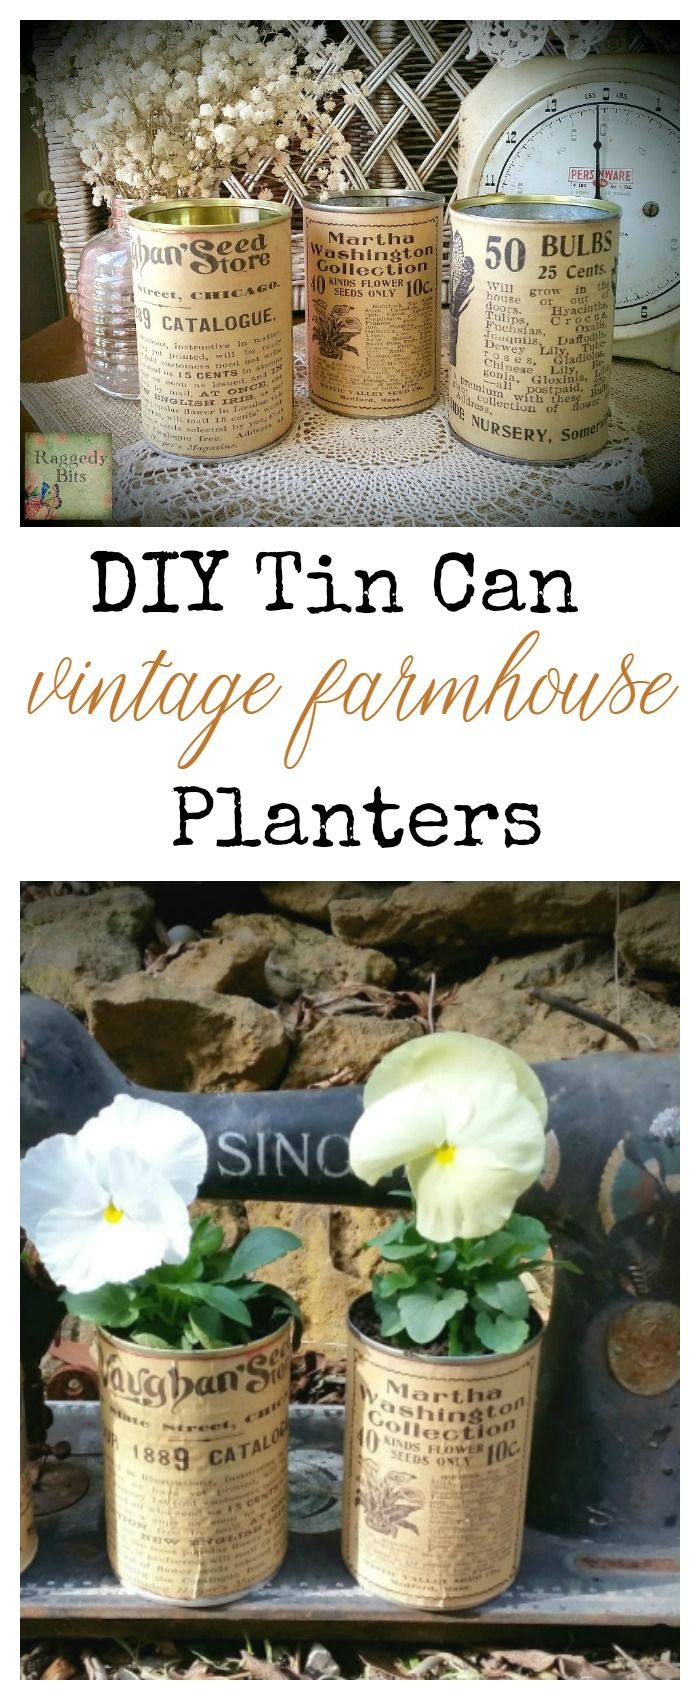 Tin can tinker raggedy bits blog adventures pinterest latas manualidades y bricolaje - Manualidades y bricolaje ...